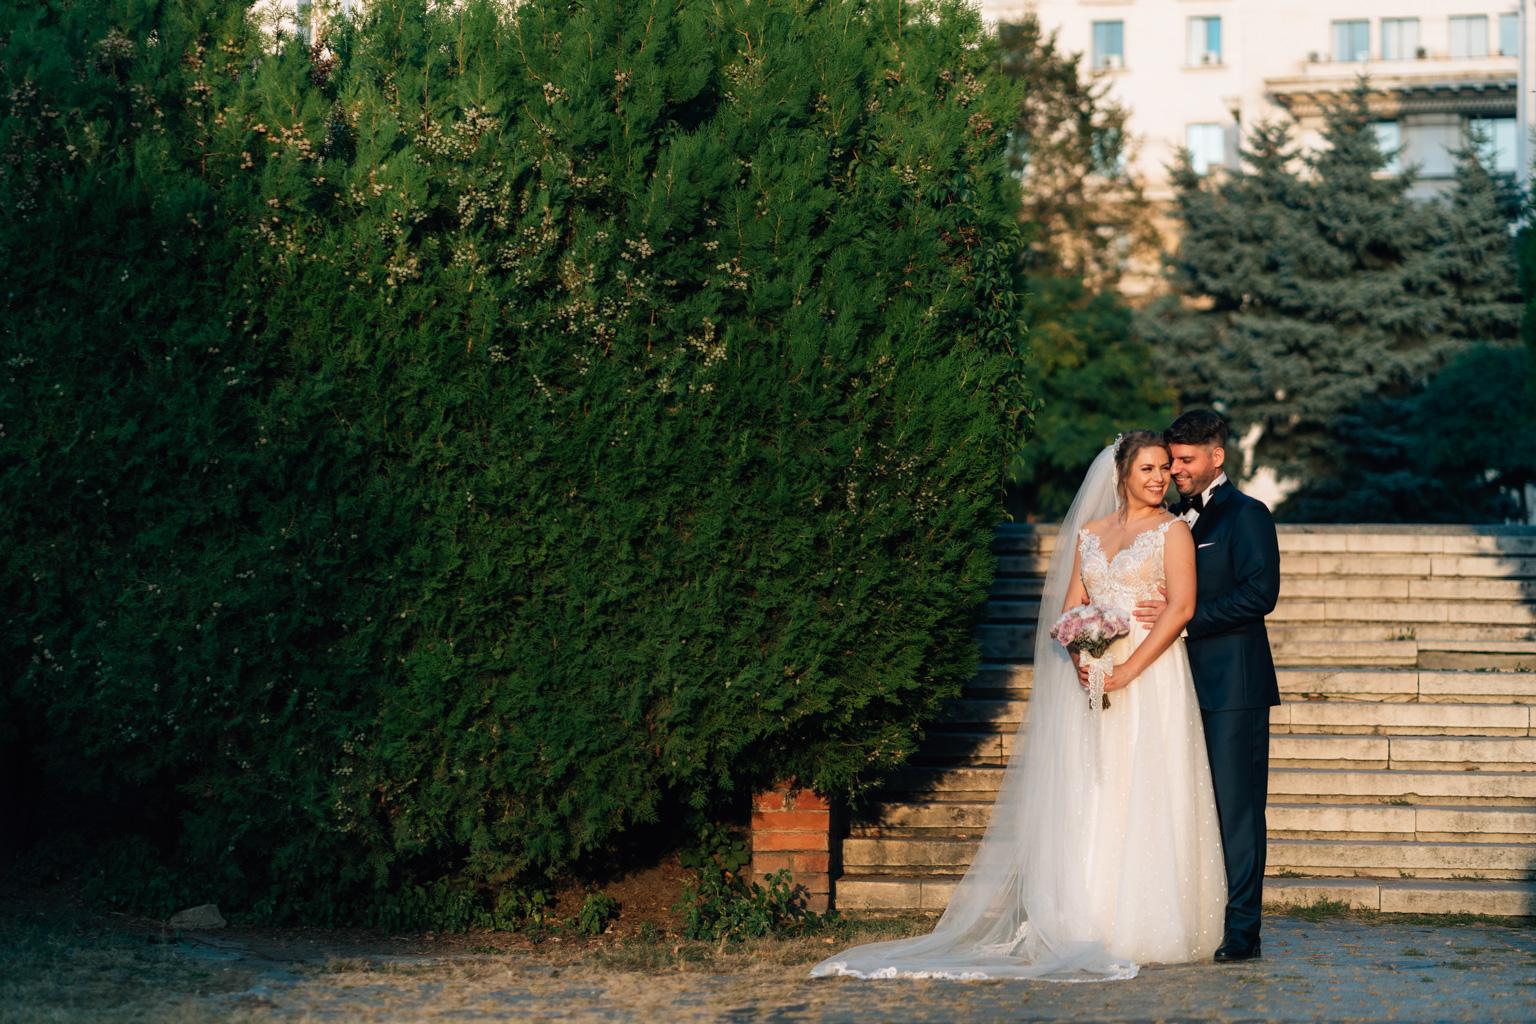 Carmen + Alin – Fotografie de nunta la JW Marriott